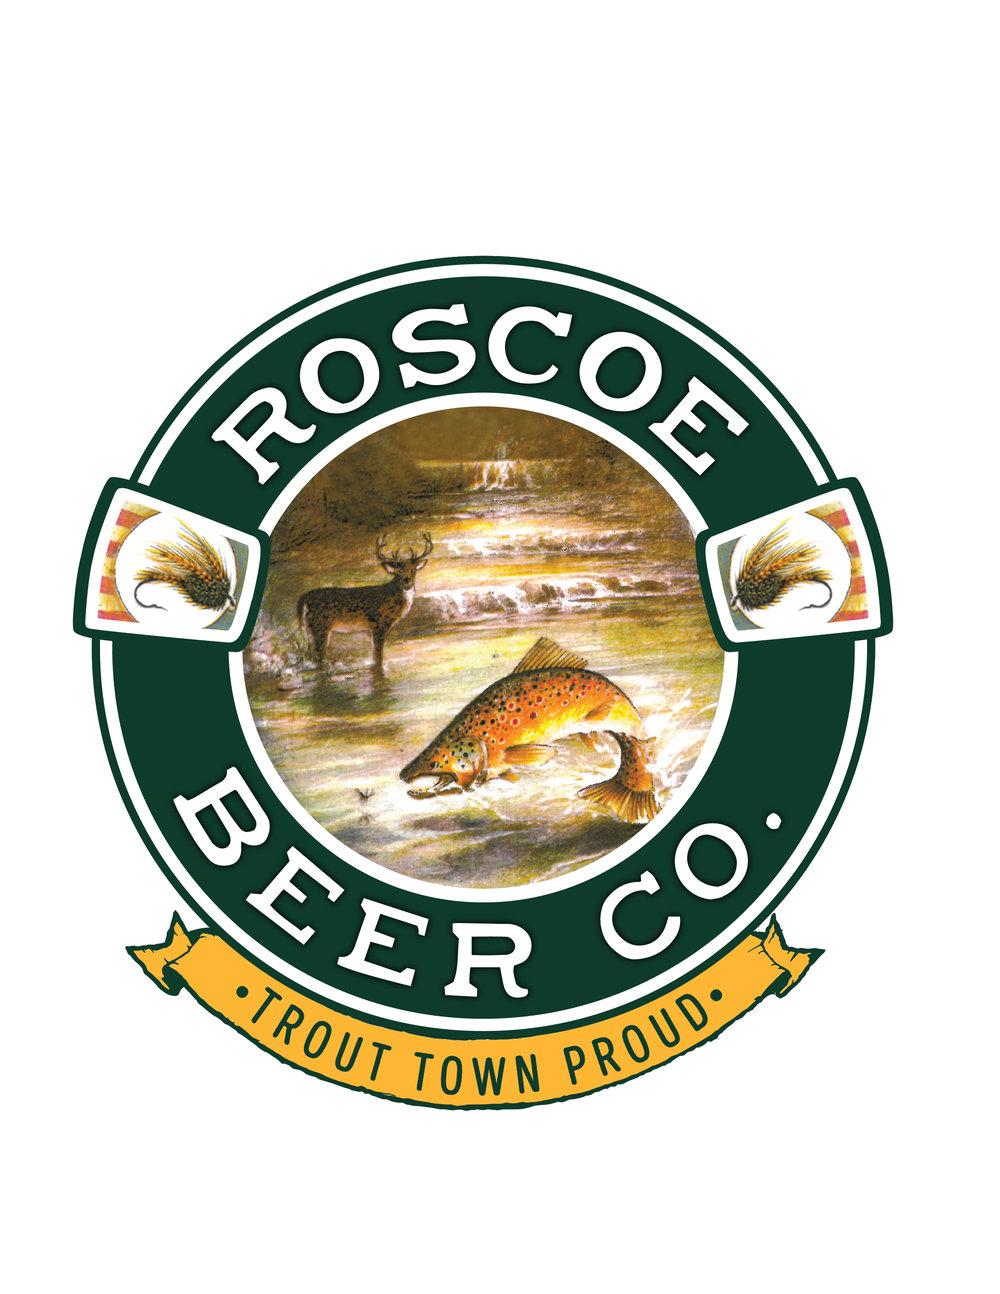 RBC-ROSCOE BEER CO LOGO_r2.jpg